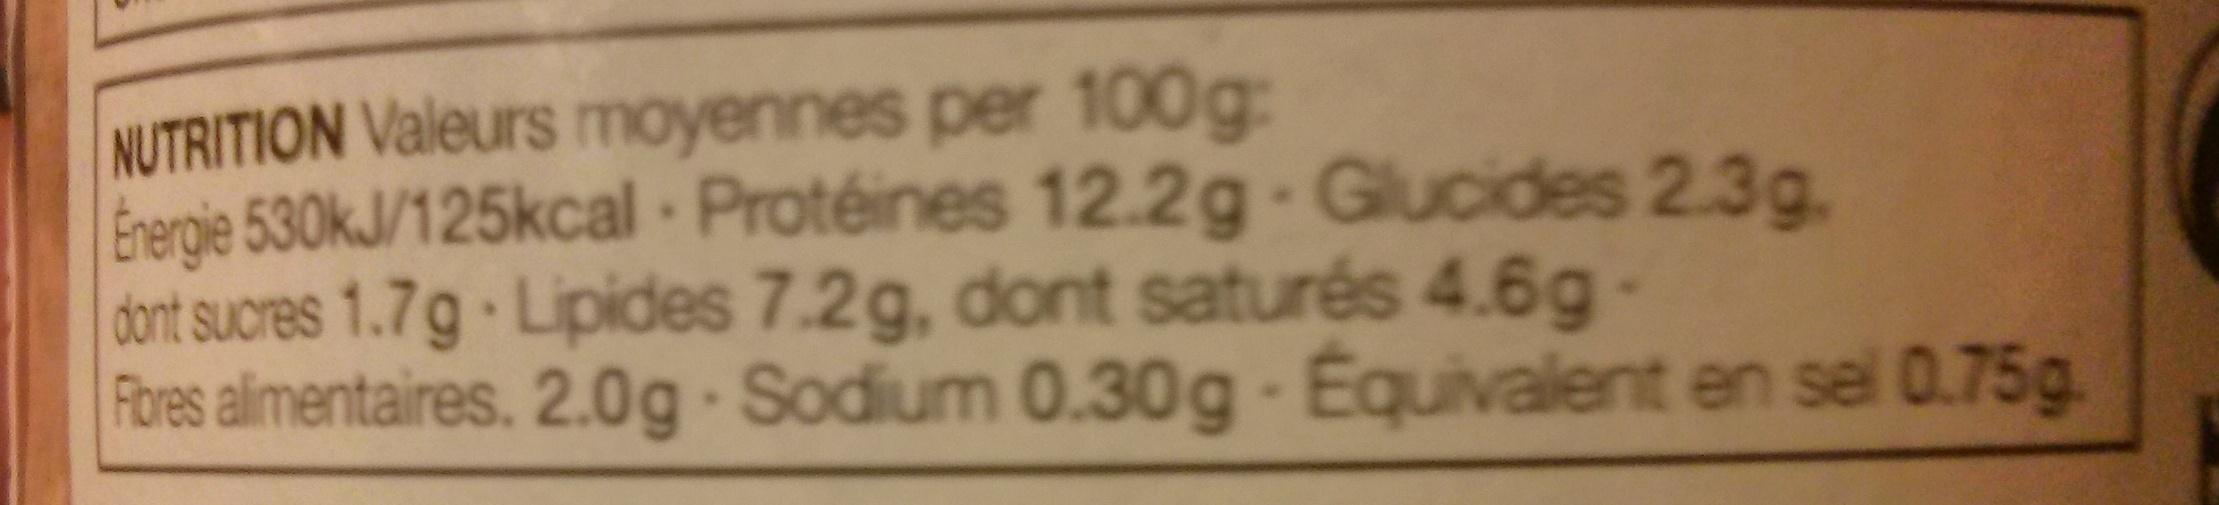 Chicken Laksa - Nutrition facts